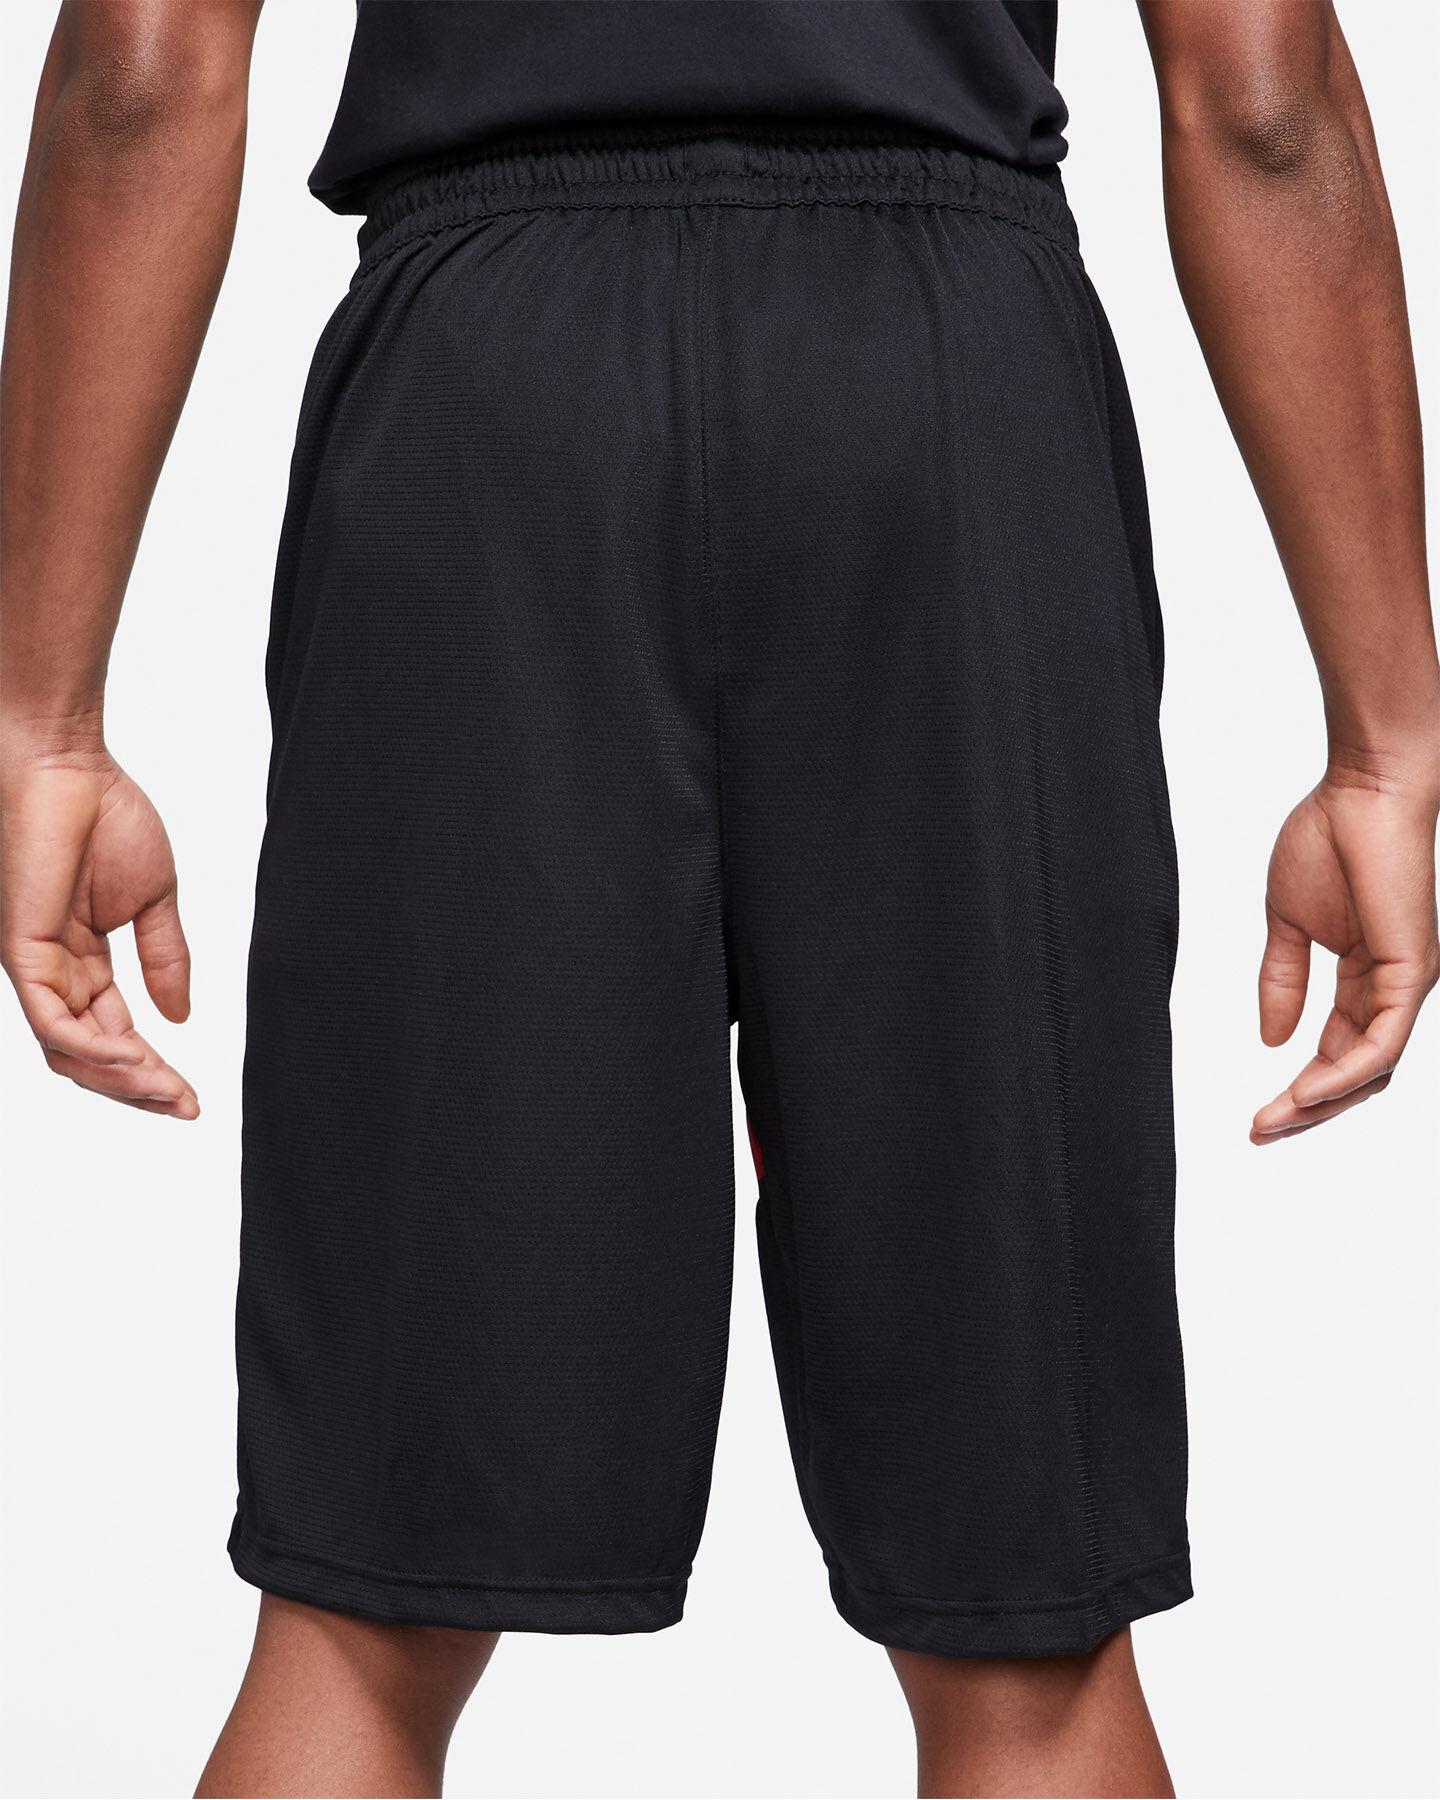 Pantaloncini basket NIKE DRY 2.0 M S5270199 scatto 2